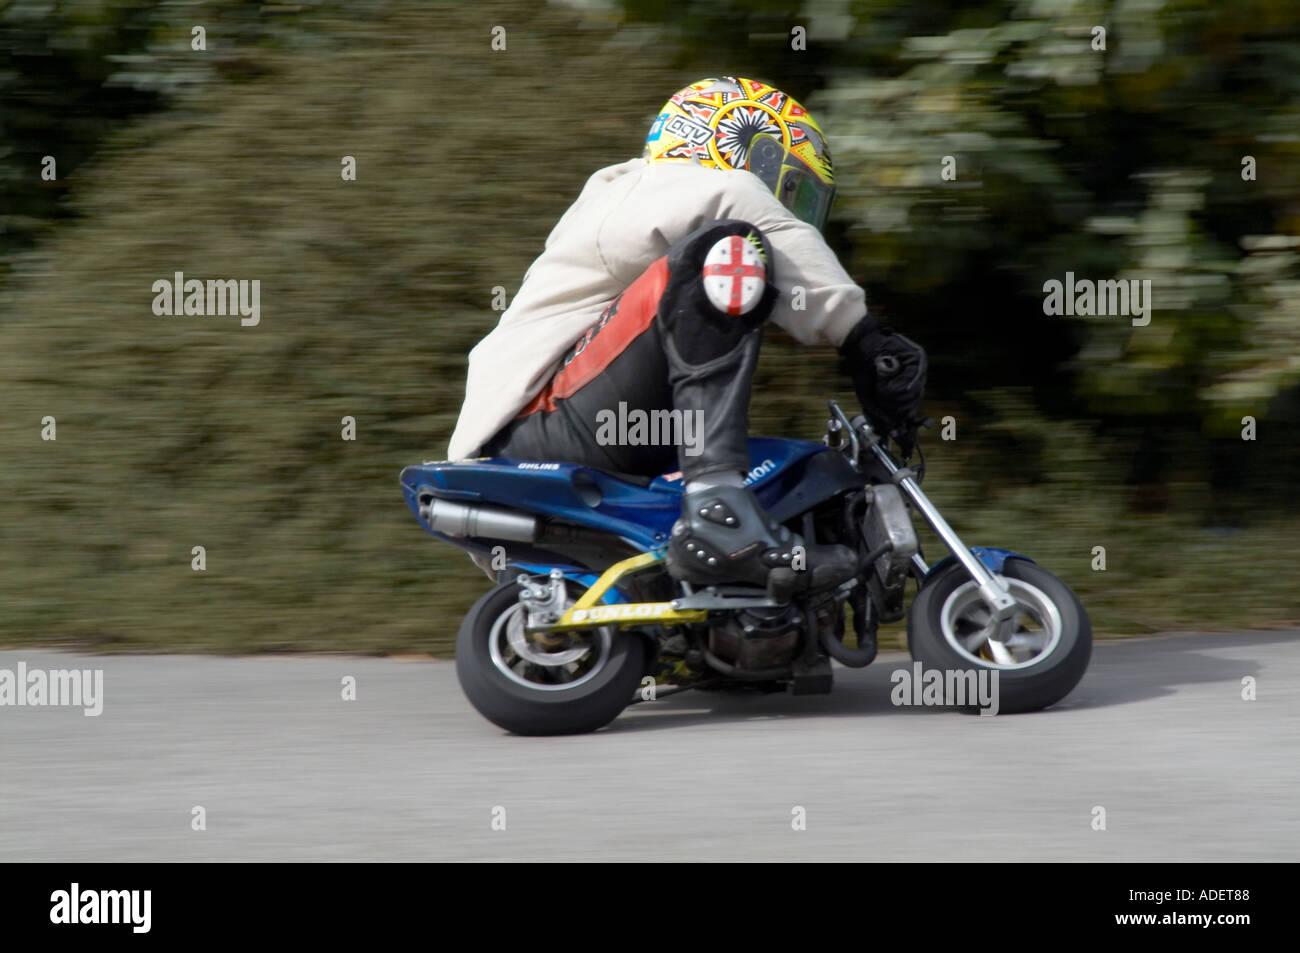 Mini Moto Moto Moto Moto Moto Petite Petite Ride Rider Cheval Miniature Mini Fun Drole Homme Amusant Fun Profitez D Enj Photo Stock Alamy